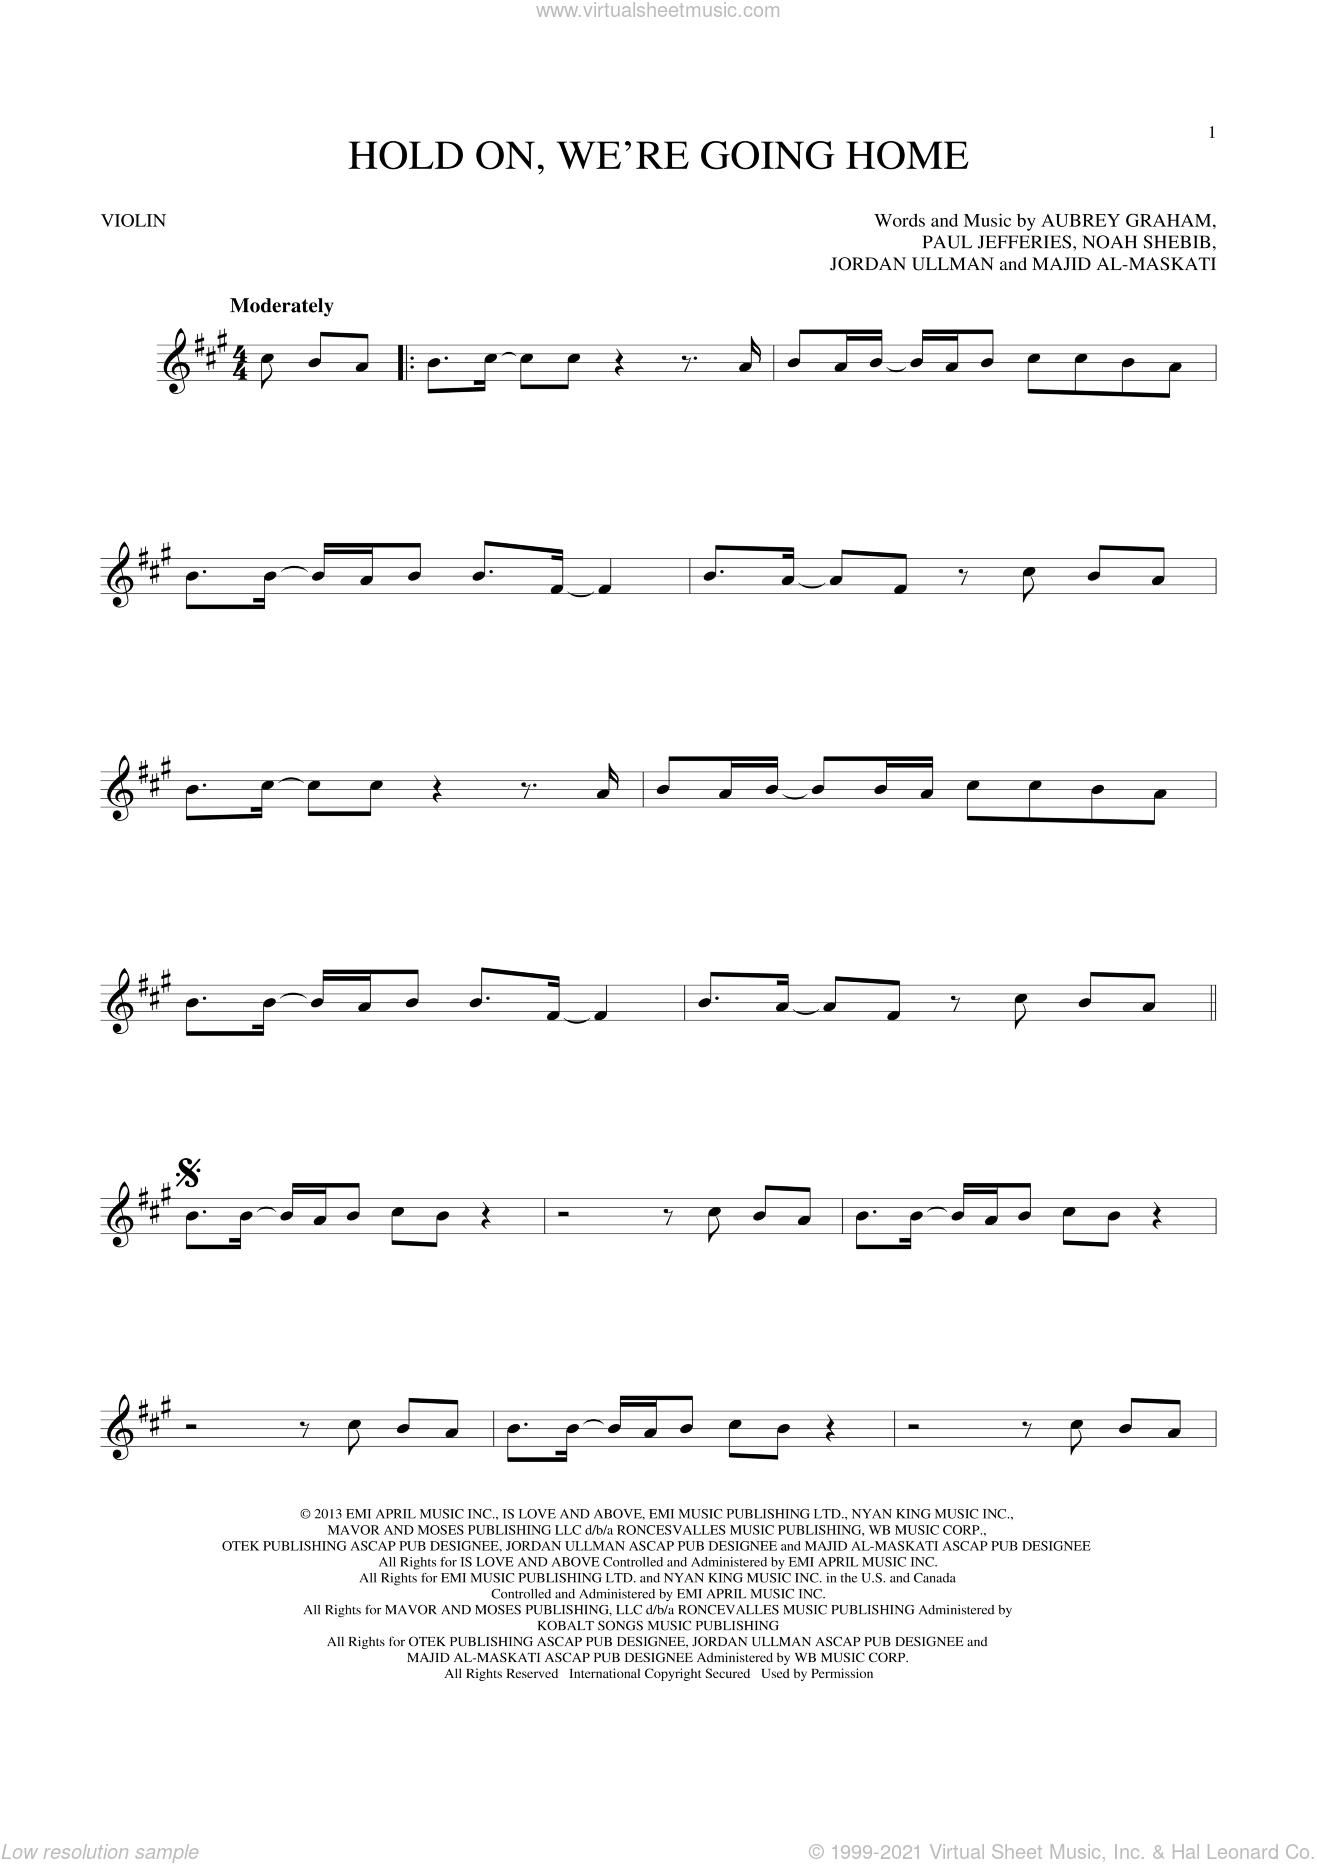 Hold On, We're Going Home sheet music for violin solo by Drake, Aubrey Graham, Jordan Ullman, Majid Al-Maskati, Noah Shebib and Paul Jefferies, intermediate skill level